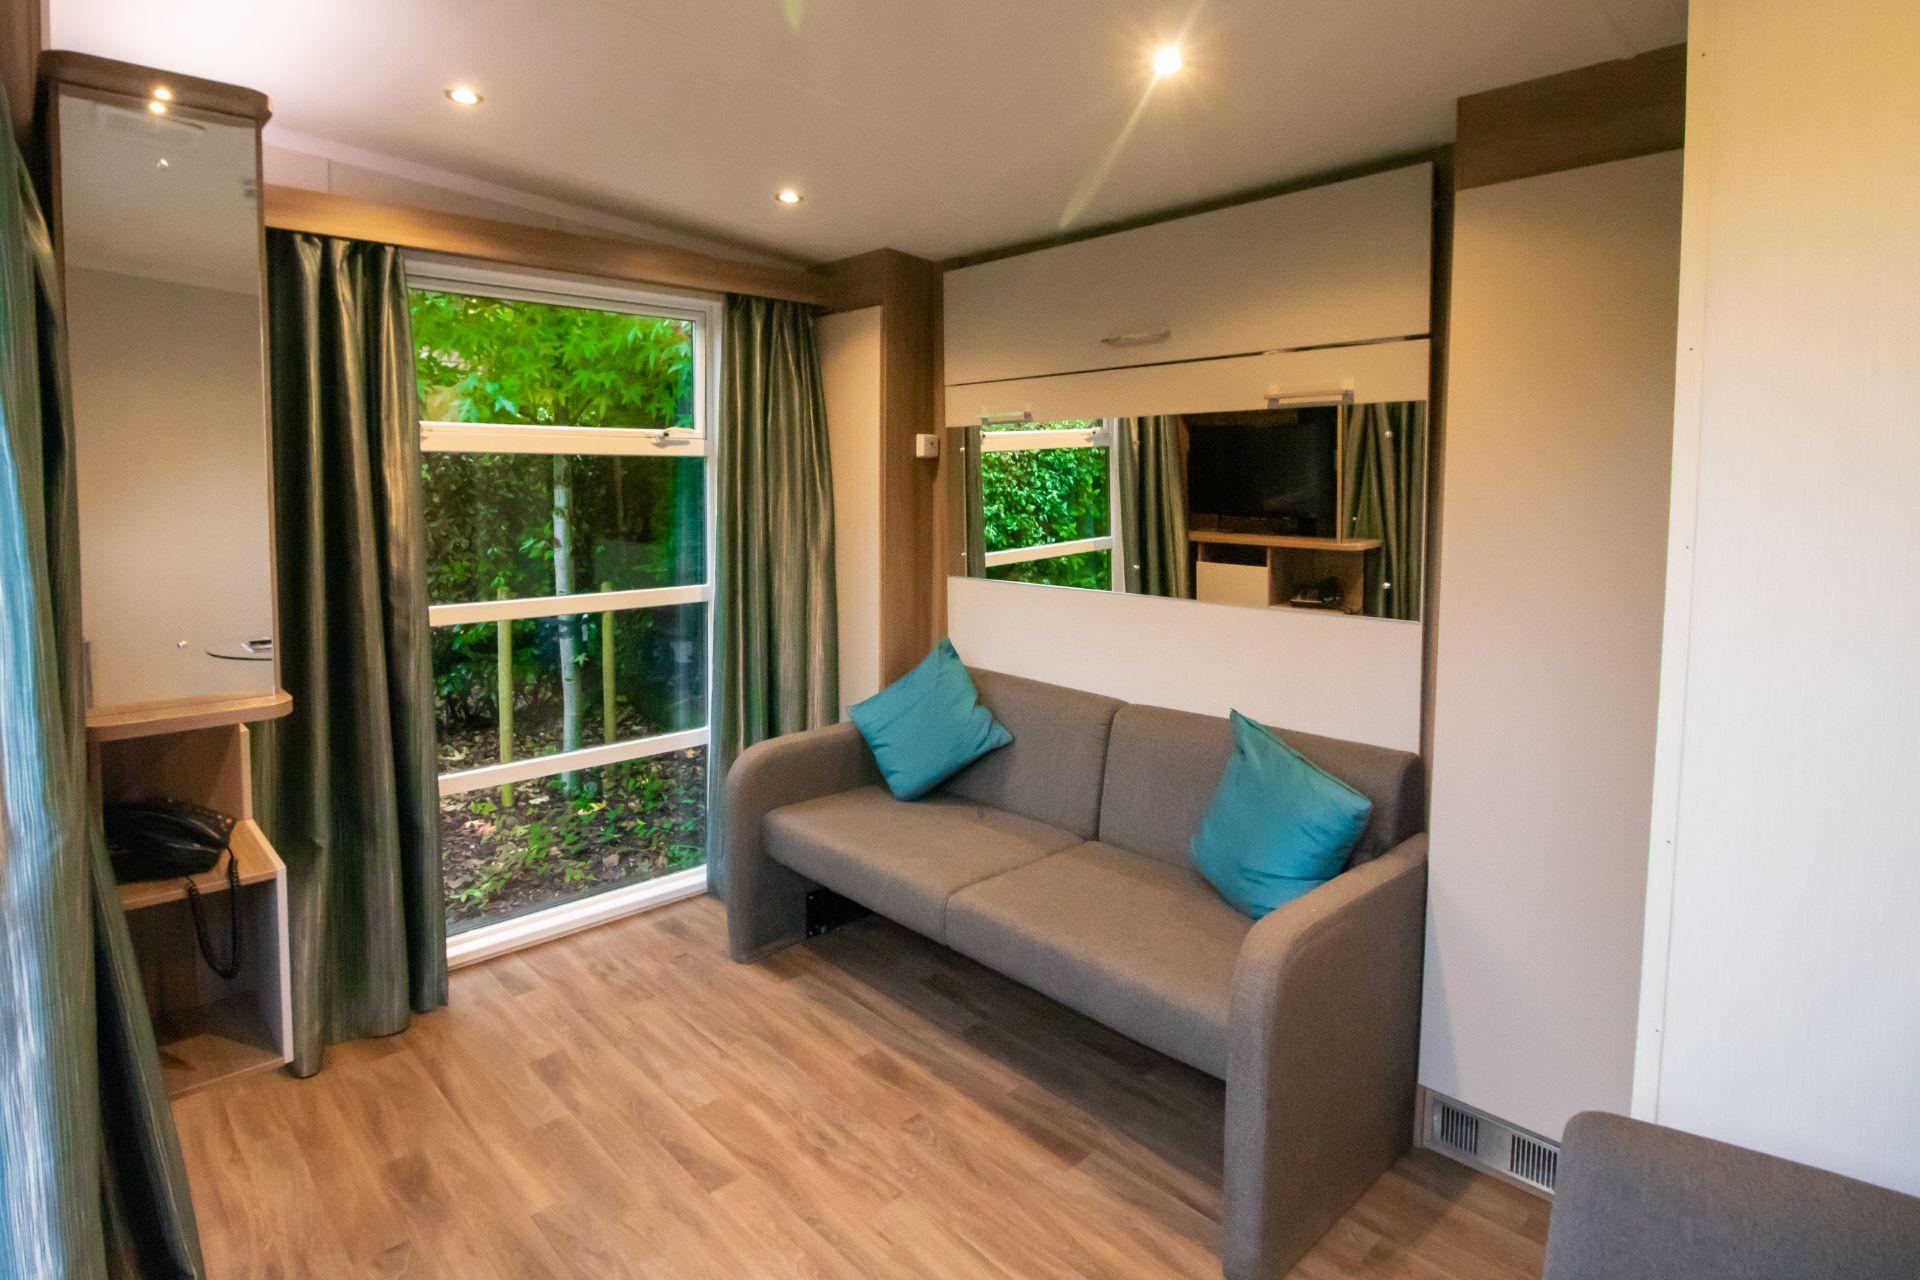 sofa-in-hotel-bedroom-in-oxwich-bay-hotel-secret-garden-pods